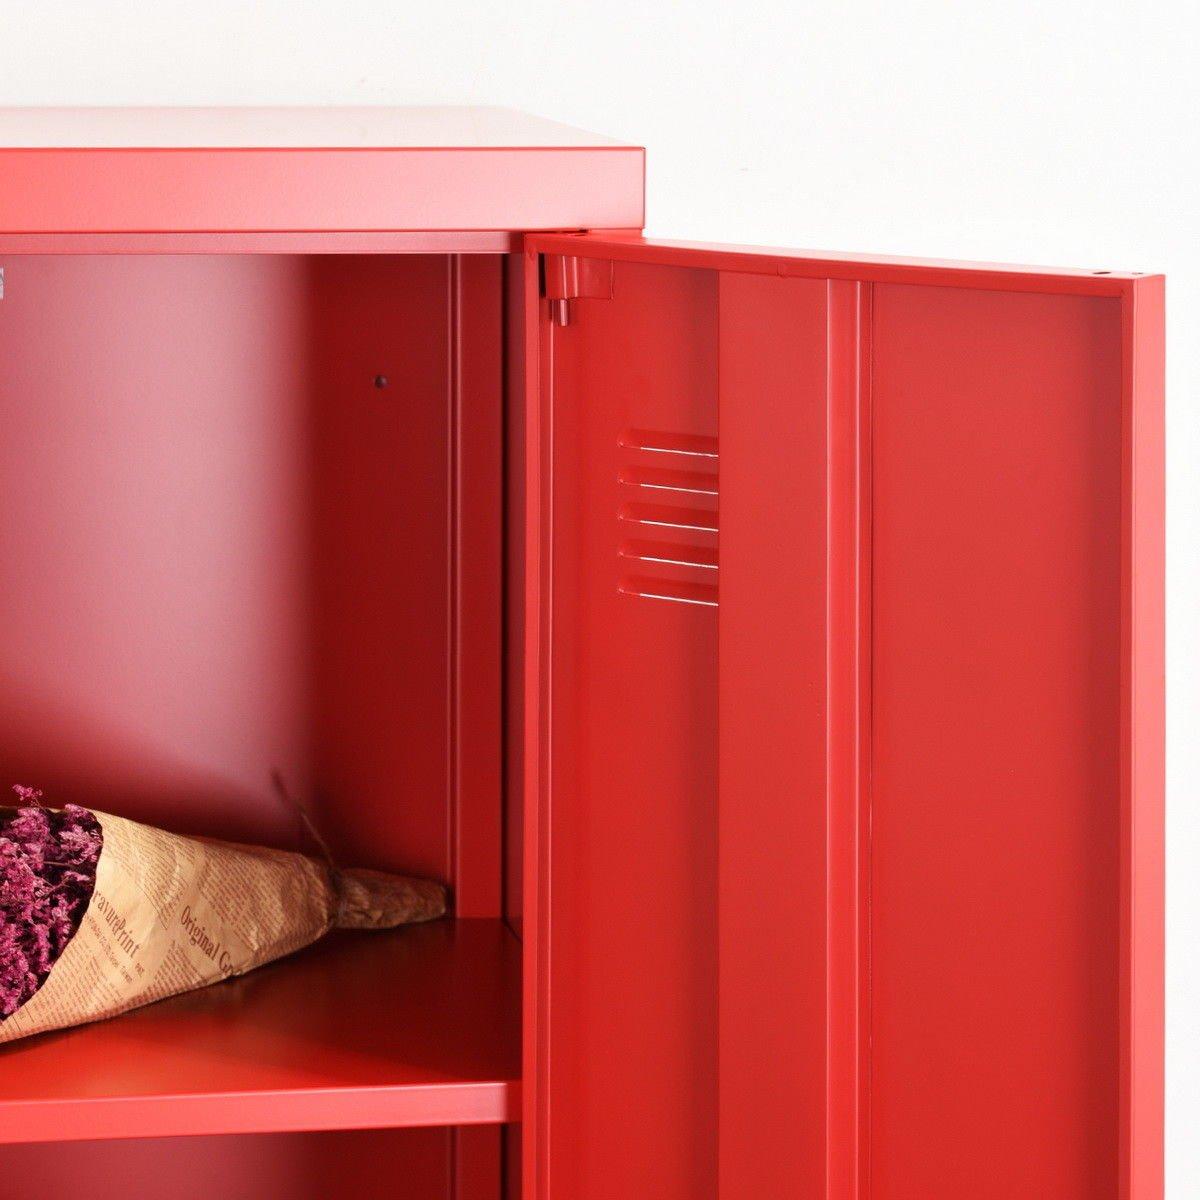 HouseinBox Office File Storage Metal Cabinet 3 Door Cupboard Locker Organizer Console Stand 3-in-1 (RED-Standing Locker) by HouseinBox (Image #5)